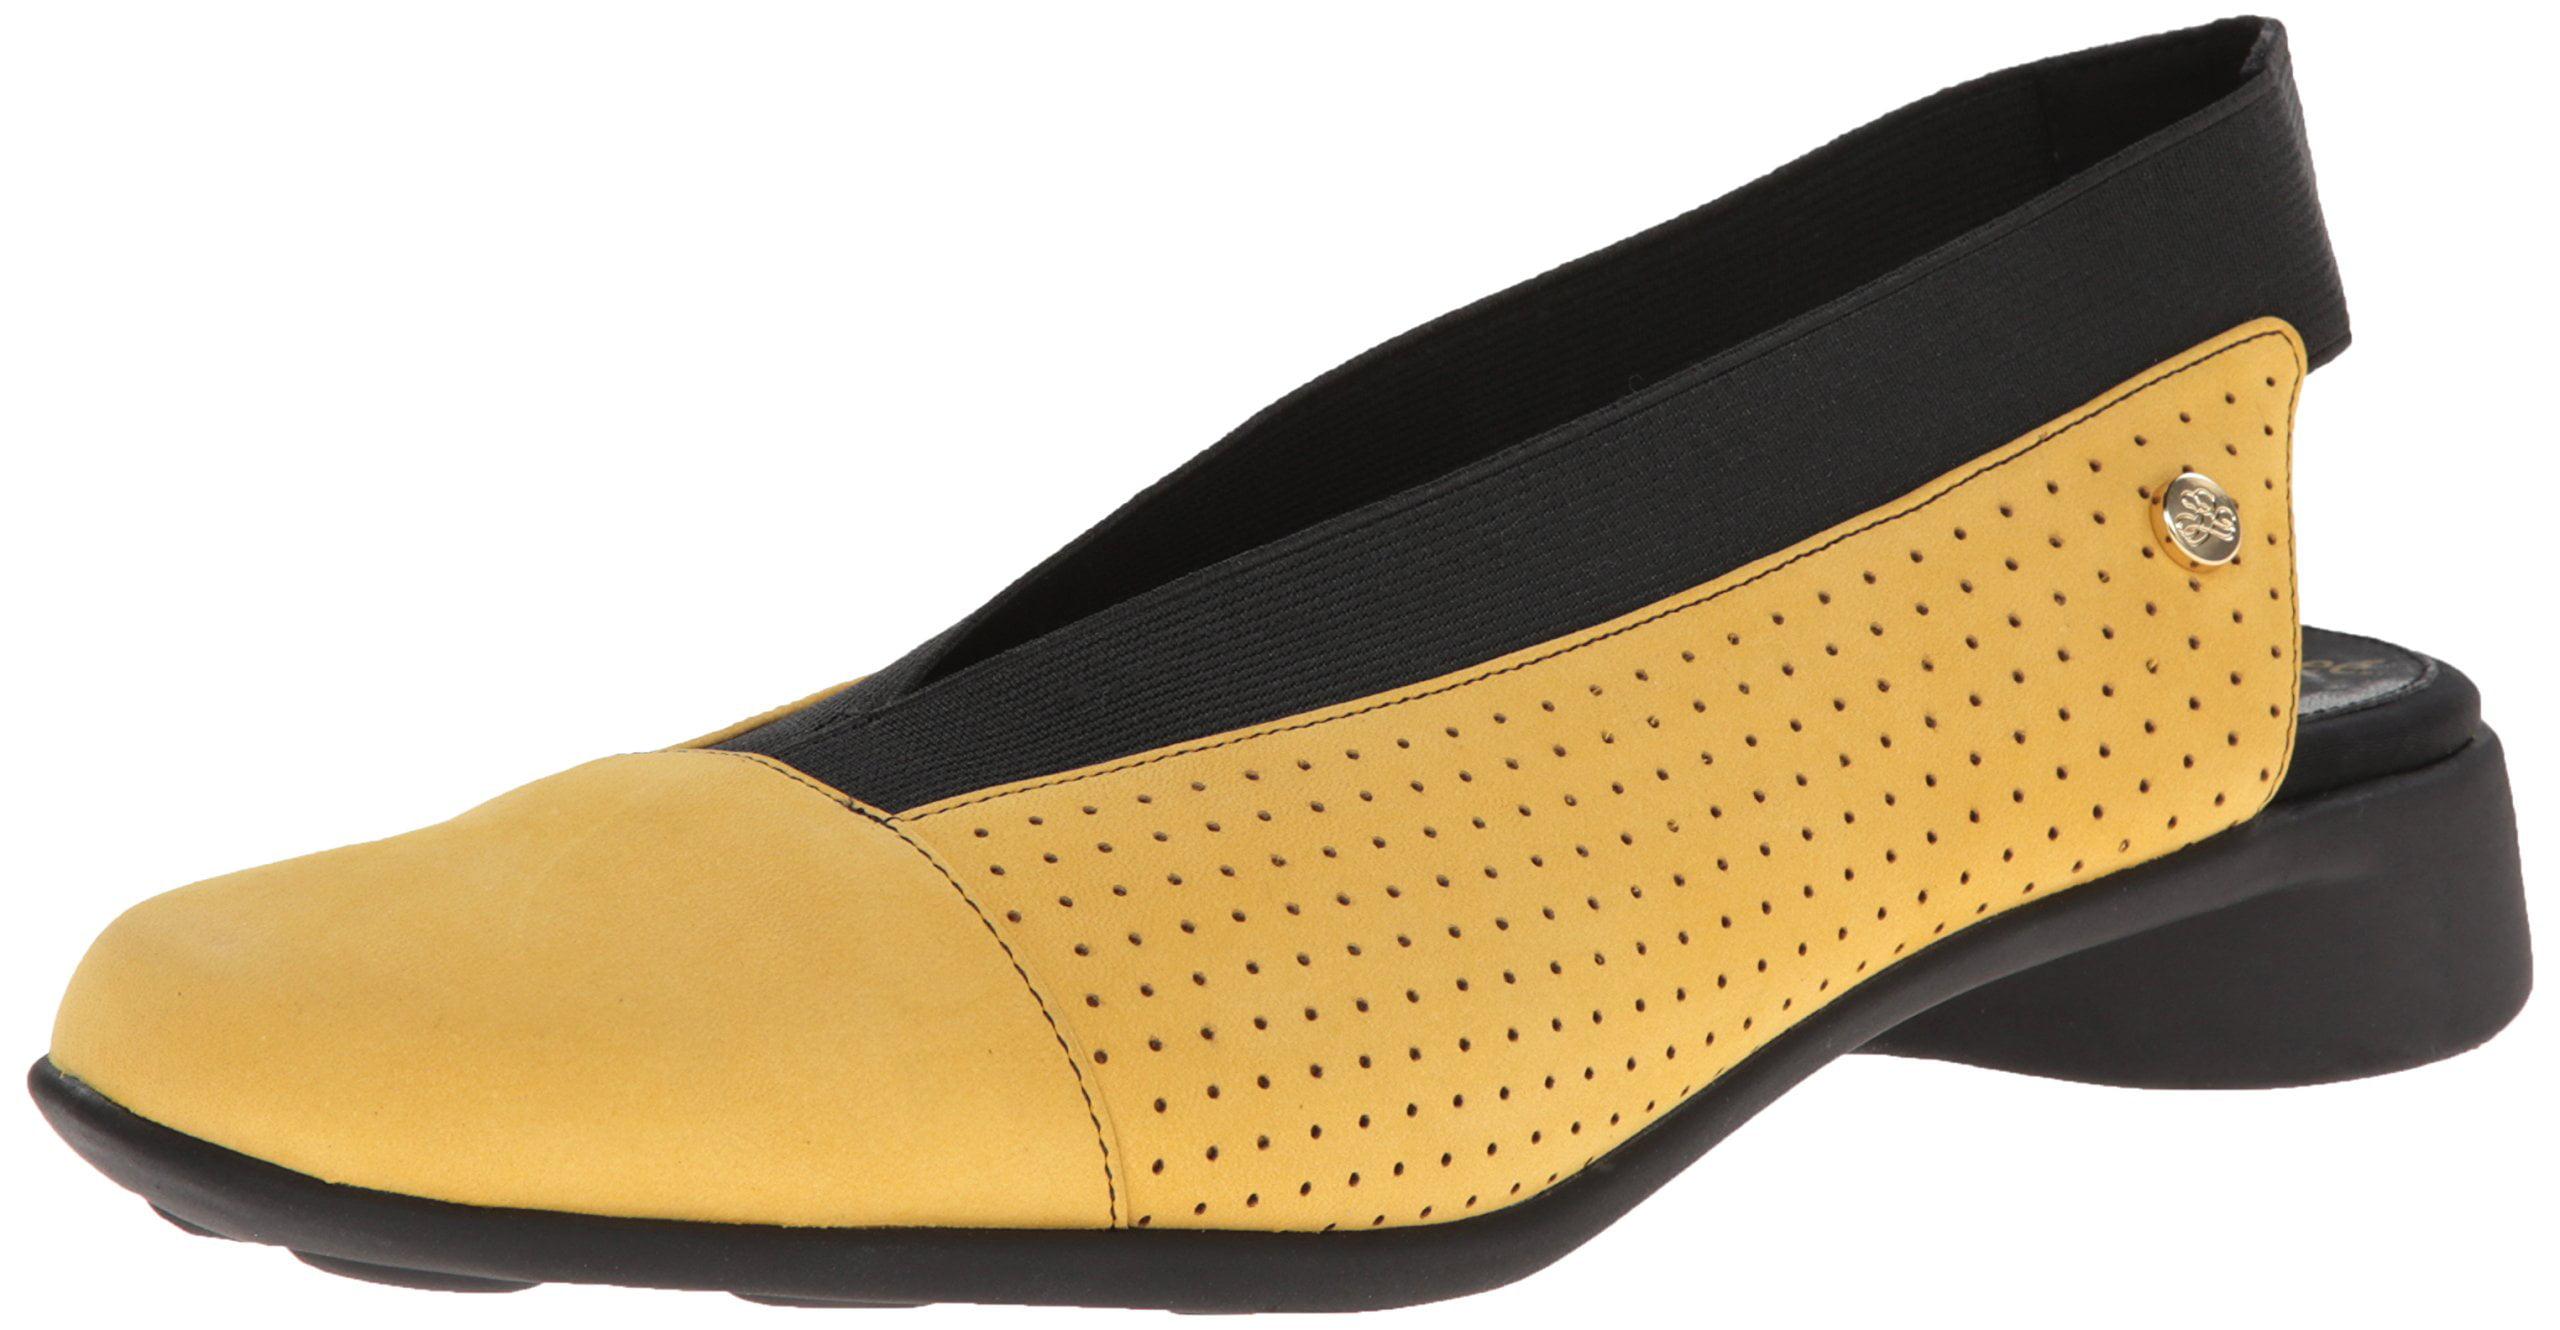 J. Renee New Yellow Niro Shoes Size 7M Stretch Slingbacks Flats by J. Renee